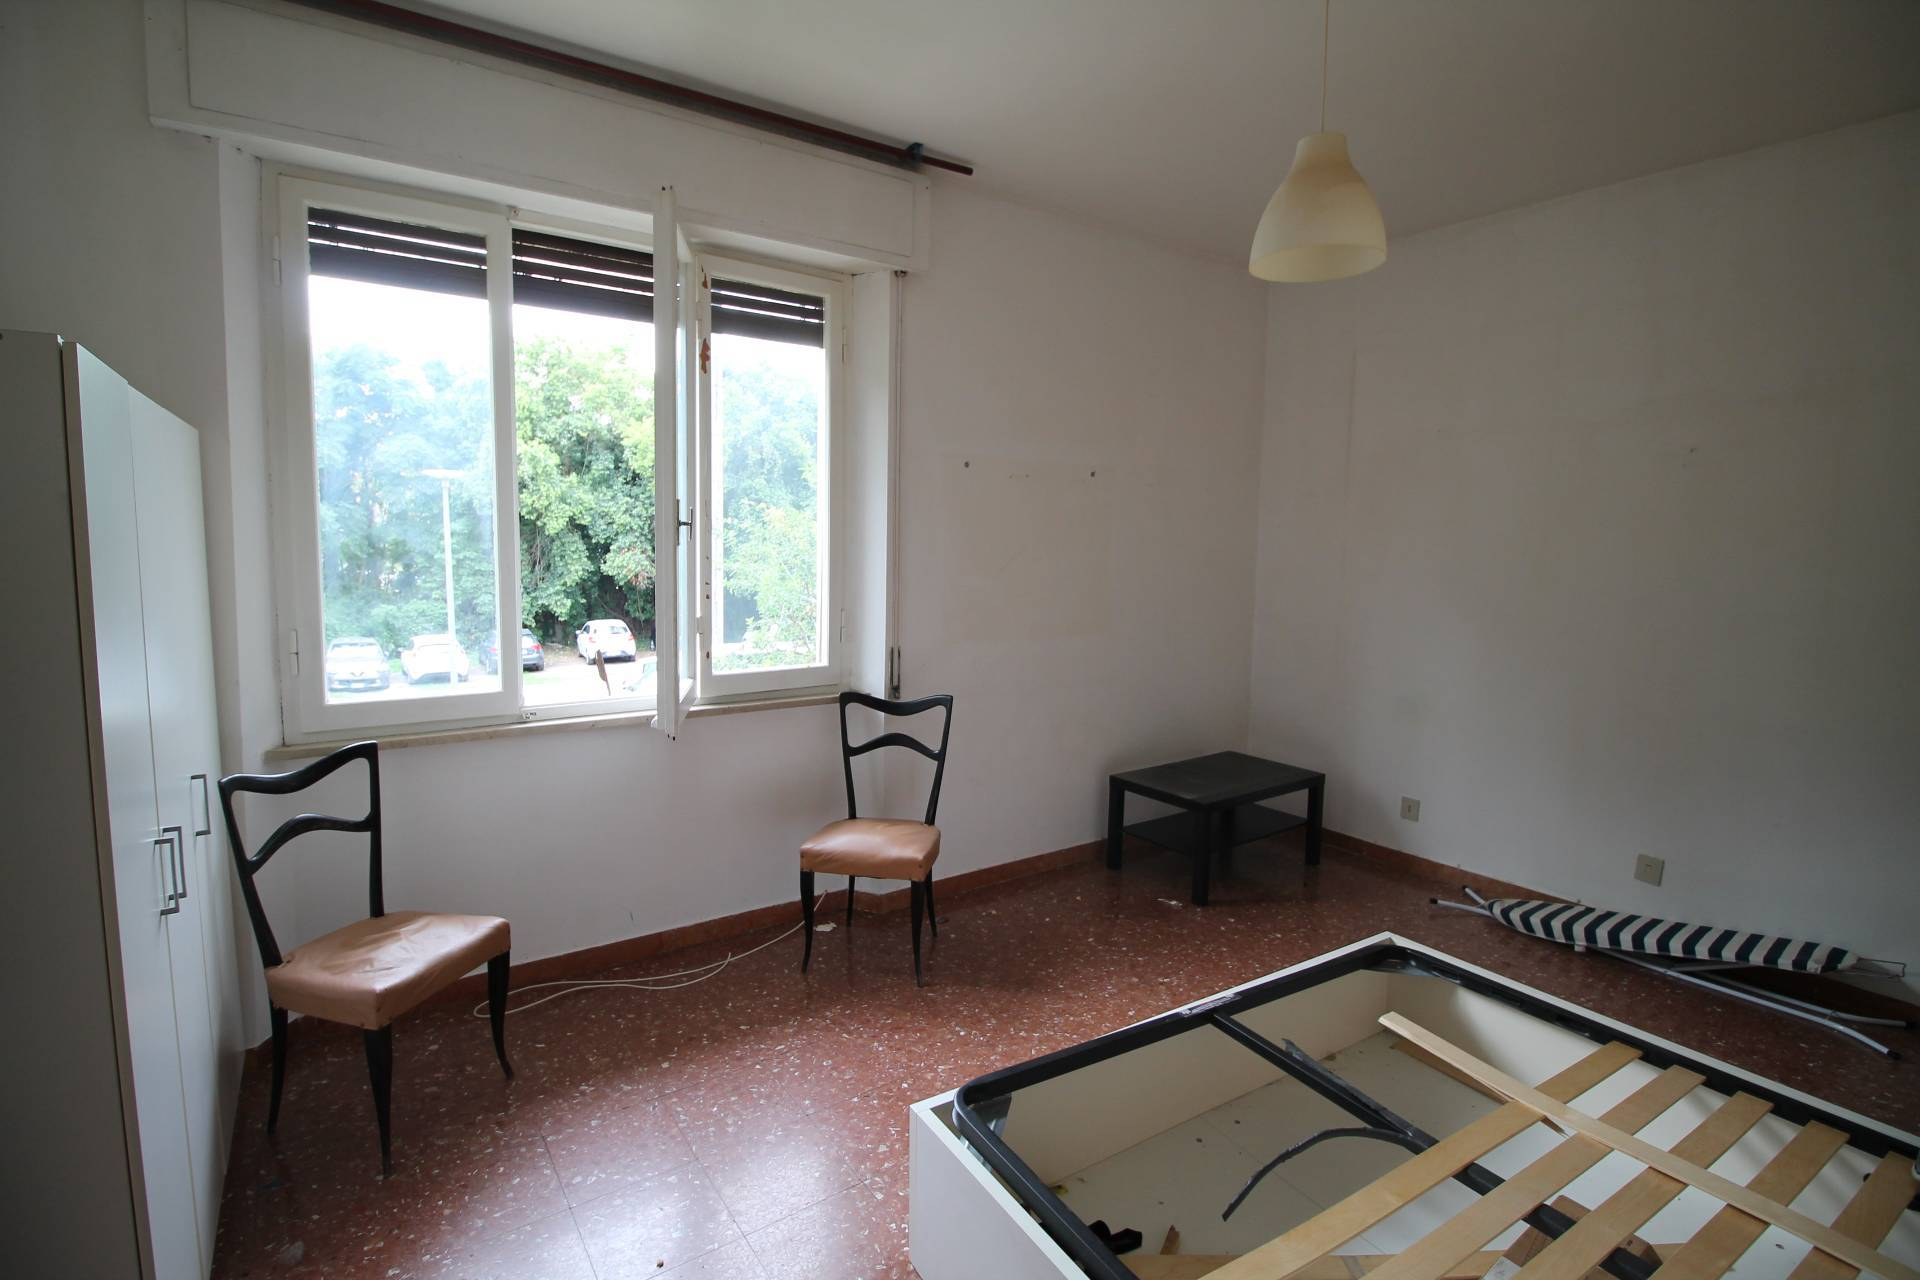 Appartamento in vendita, rif. V2800B